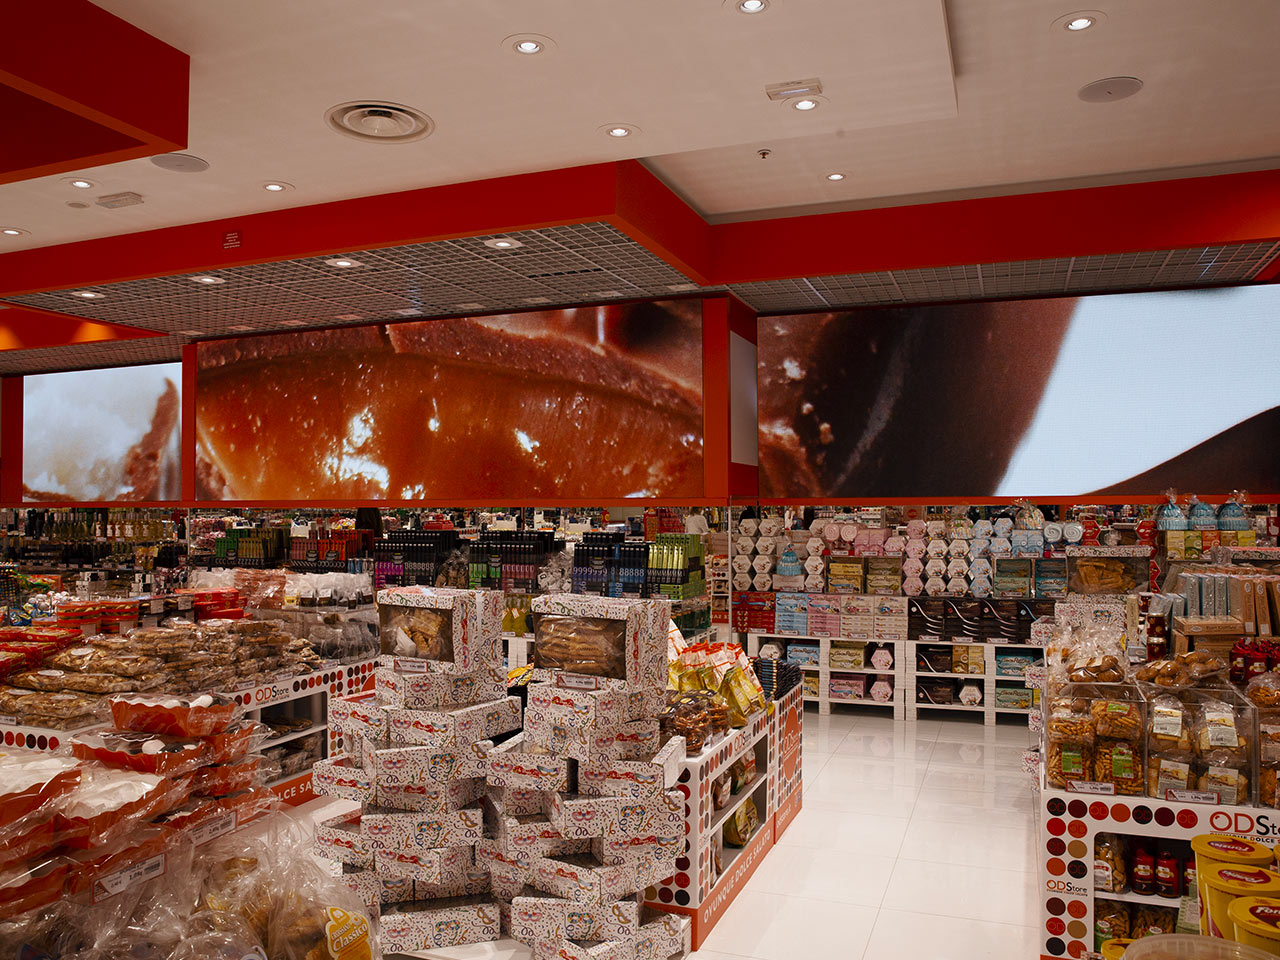 ODStore ledwall perimetrale Digital Signage banner LED Store